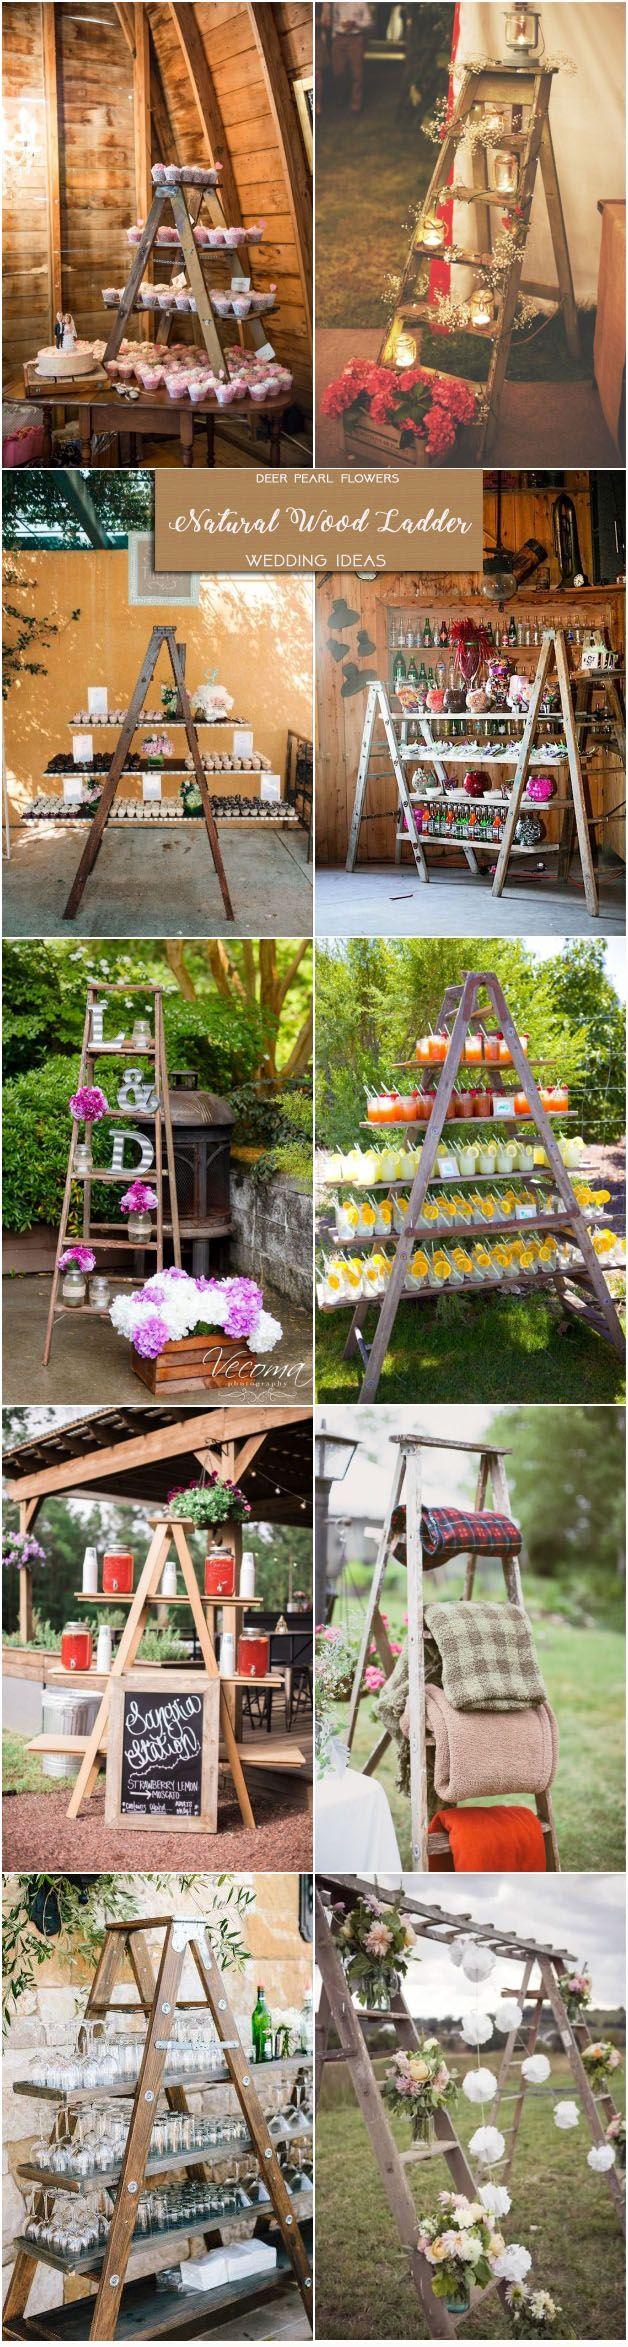 Wood wedding decoration ideas  Top  Rustic Wedding Themes u Ideas for  Part II  Creating